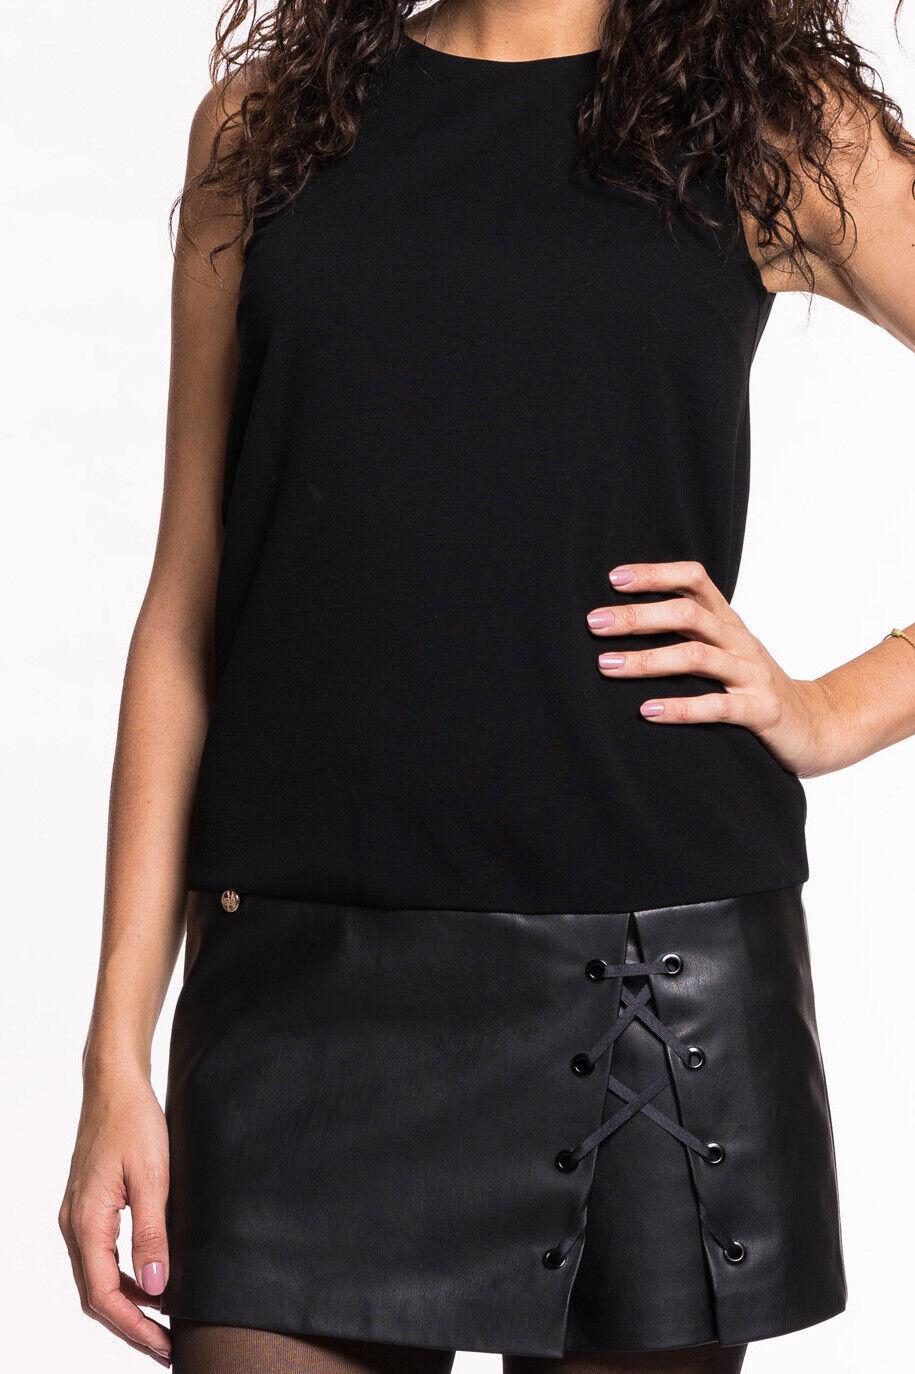 Liu Jo - Kleid Damen kurzes Lederkleid Etuikleid schwarz Designer Neu